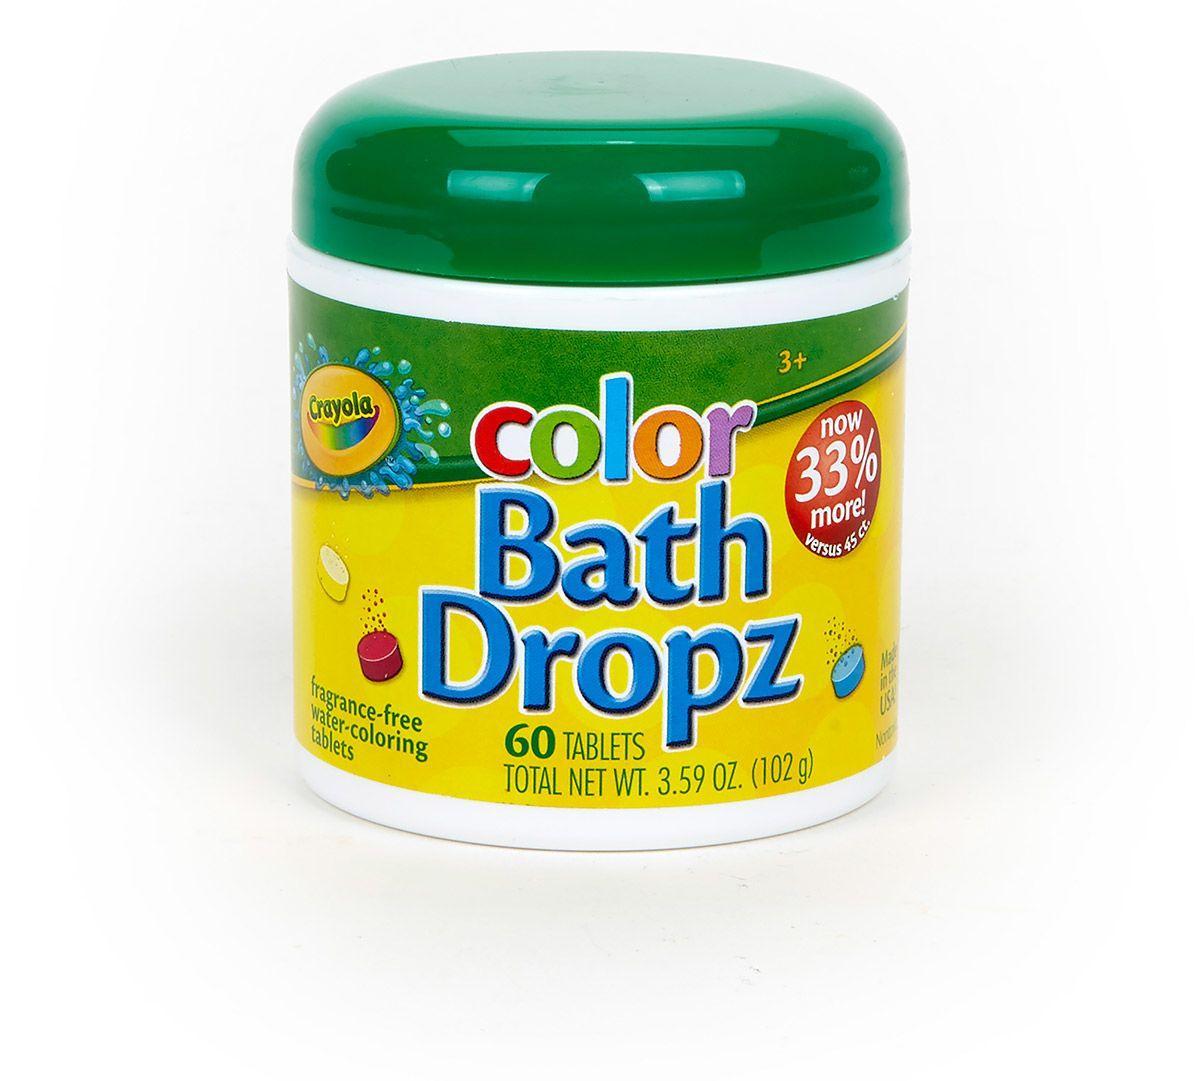 Crayola Color Bath Dropz 3 59 Ounce 60 Tablets Amazon